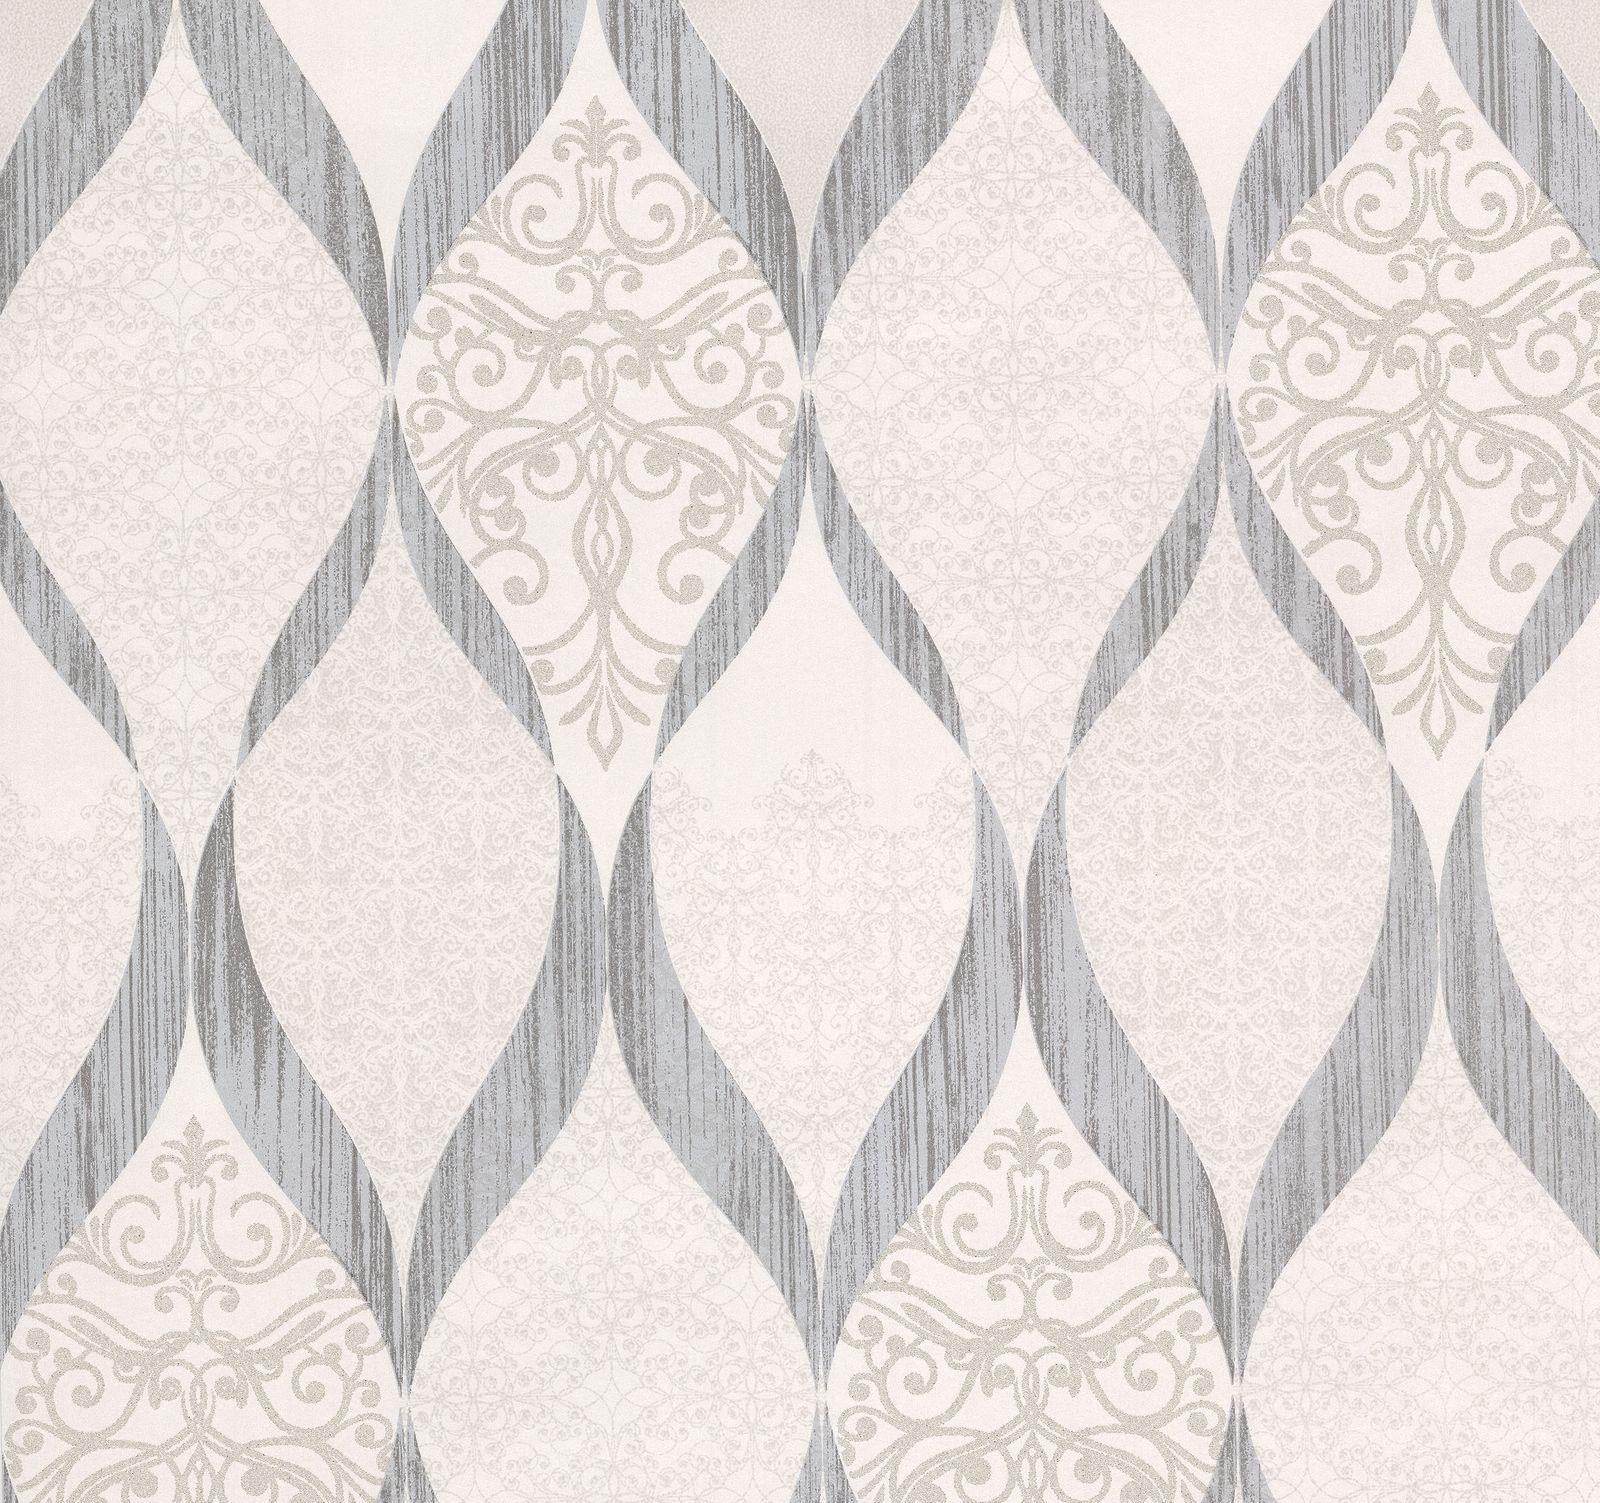 Wallpaper Kretschmer Deluxe Orient Glass Beads White Grey 41006 50